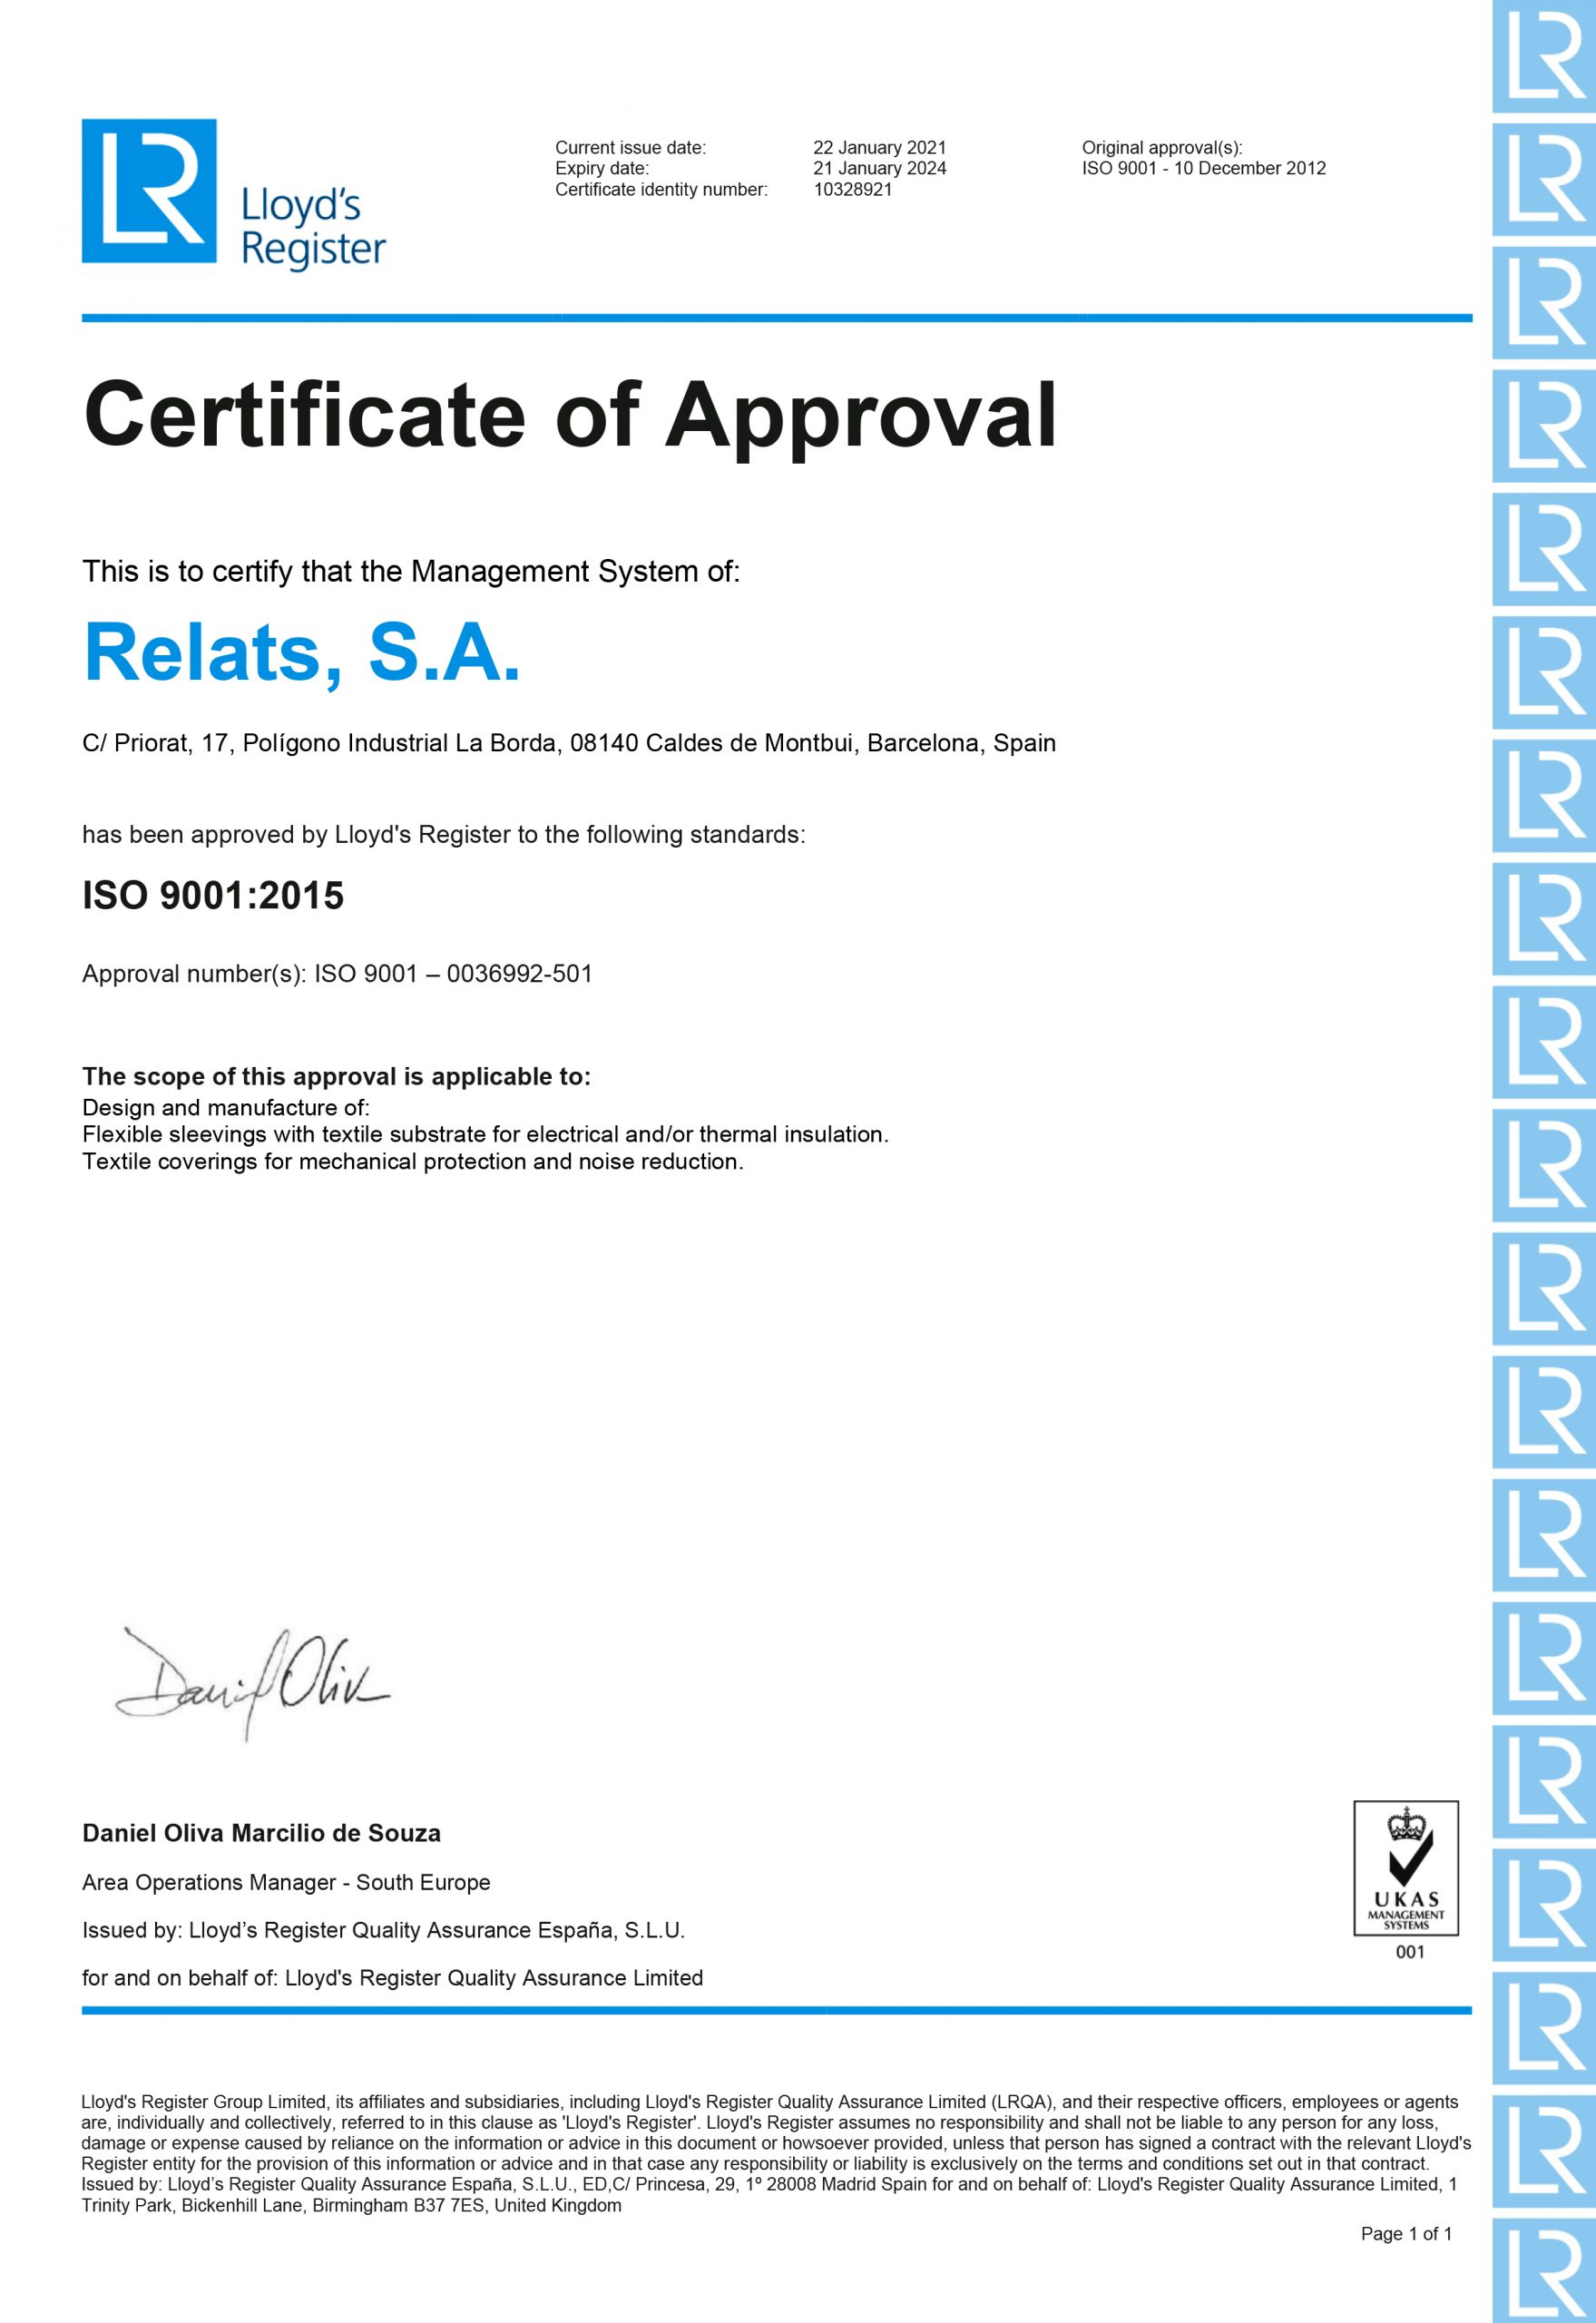 ISO 9001:2015 Relats Caldes de Montbui